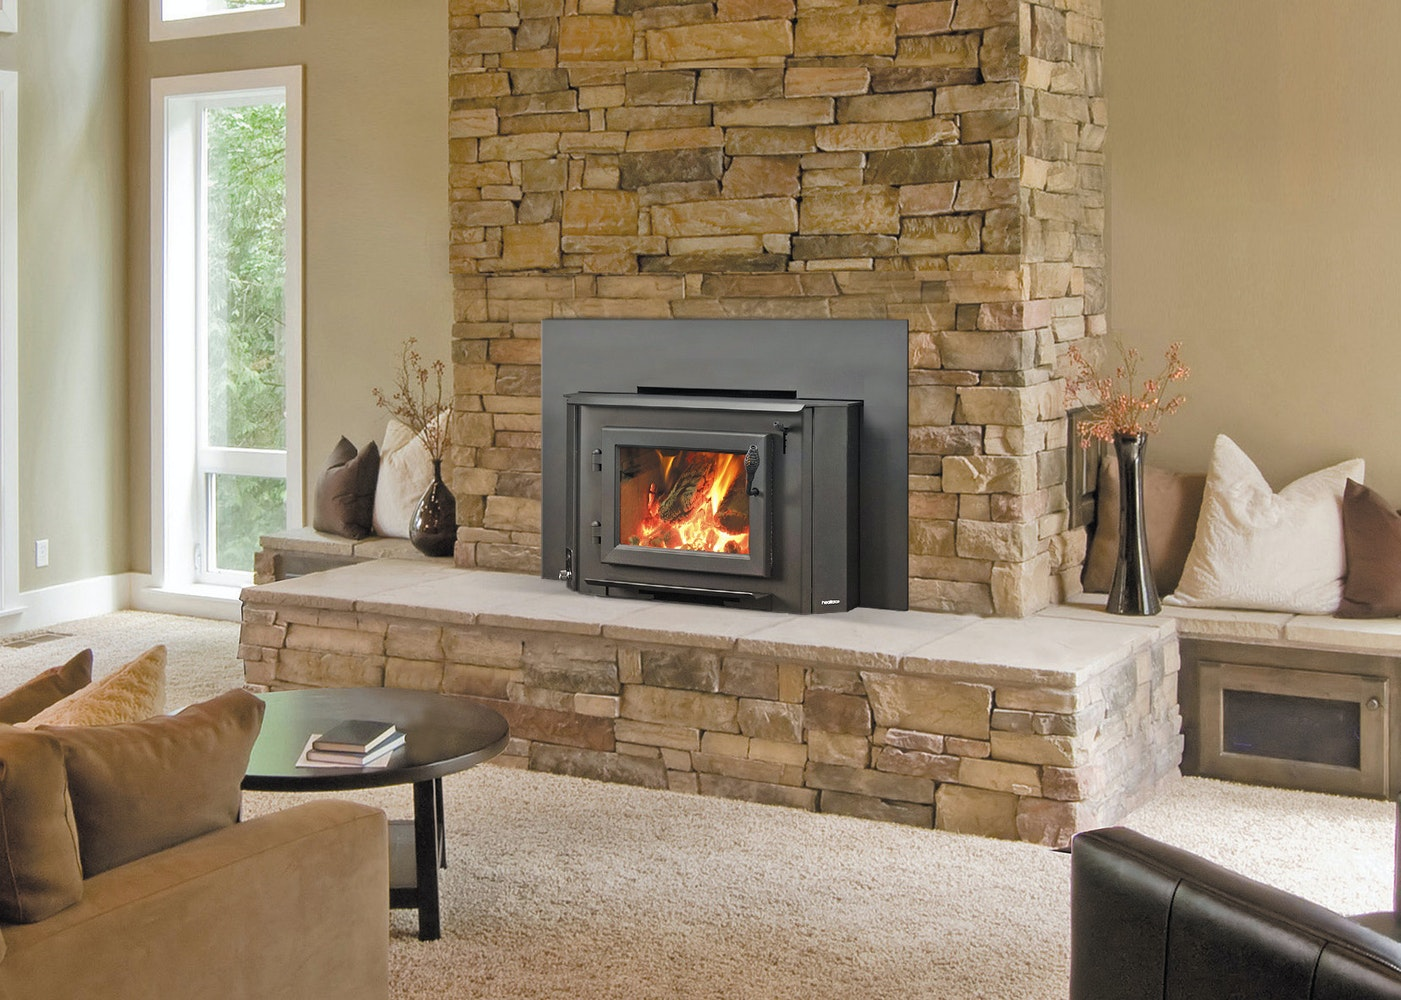 Heatilator Ecochoice Heatilator Eco Choice Wins18 Slow Combustion Wood Burning Fireplace Insert